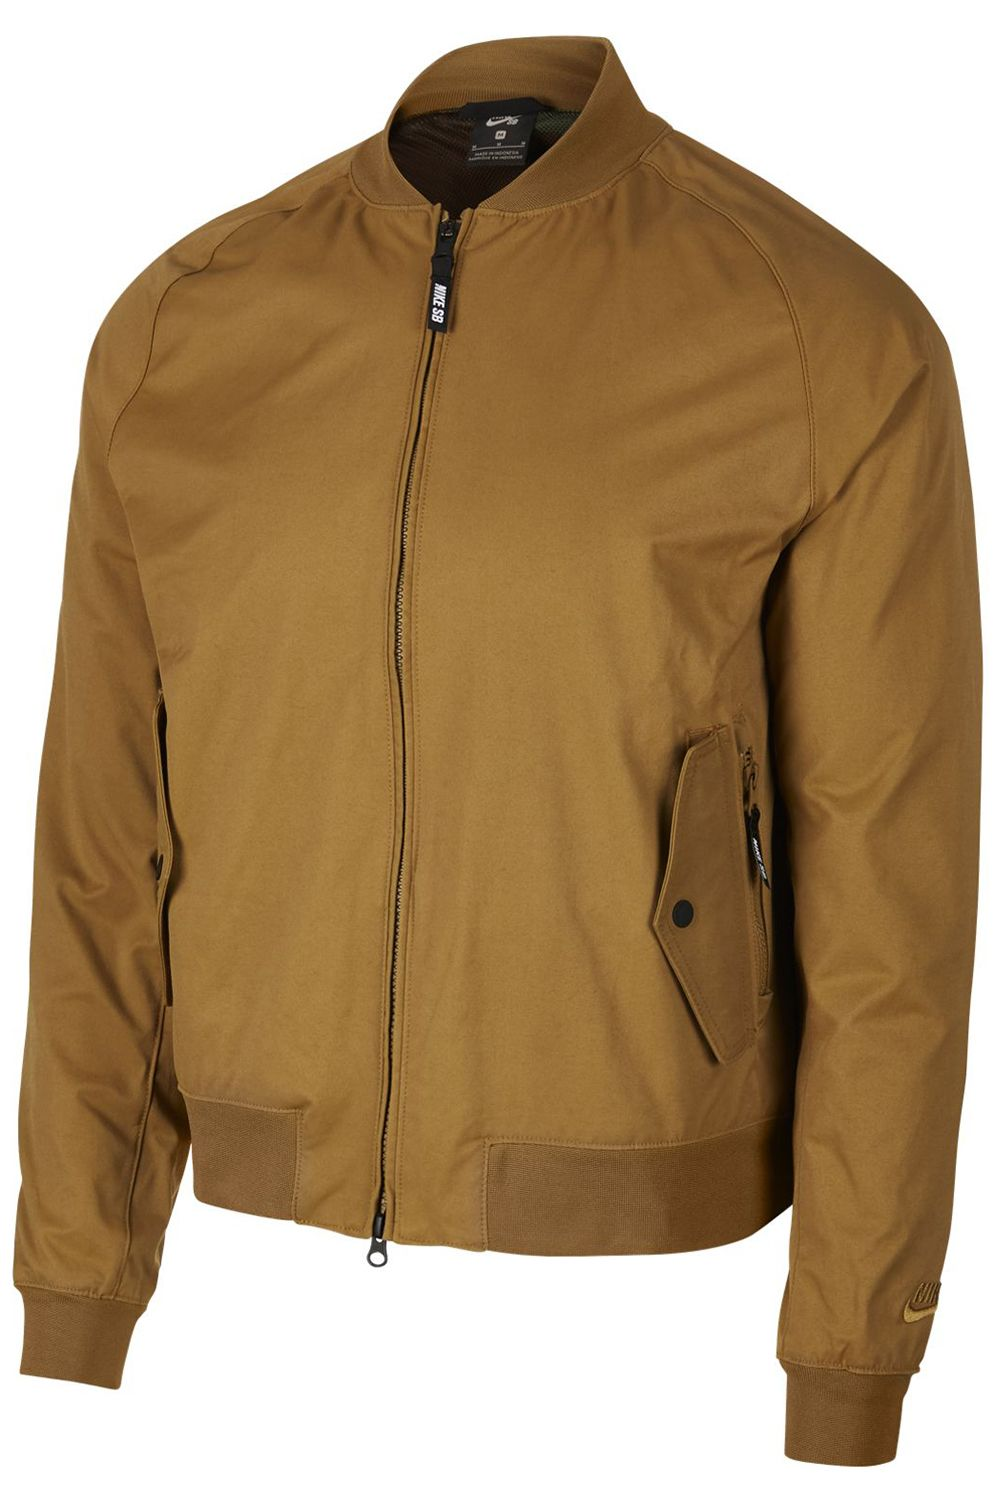 Nike Sb Jacket BOMBER Golden Beige/(Golden Beige)